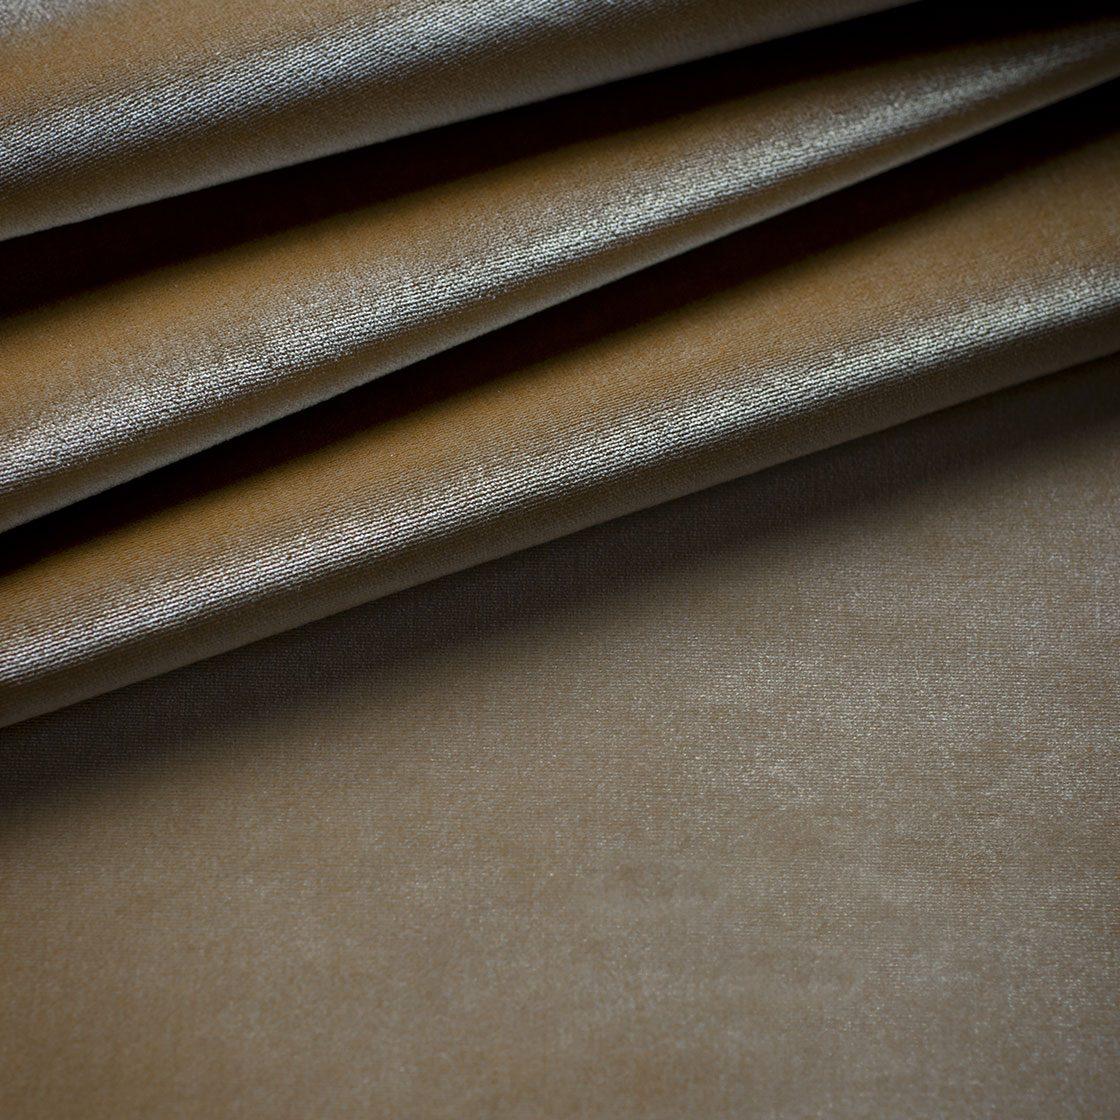 Capri Silk Velvet - Cinnamon - Beaumont & Fletcher - Beaumont & Fletcher